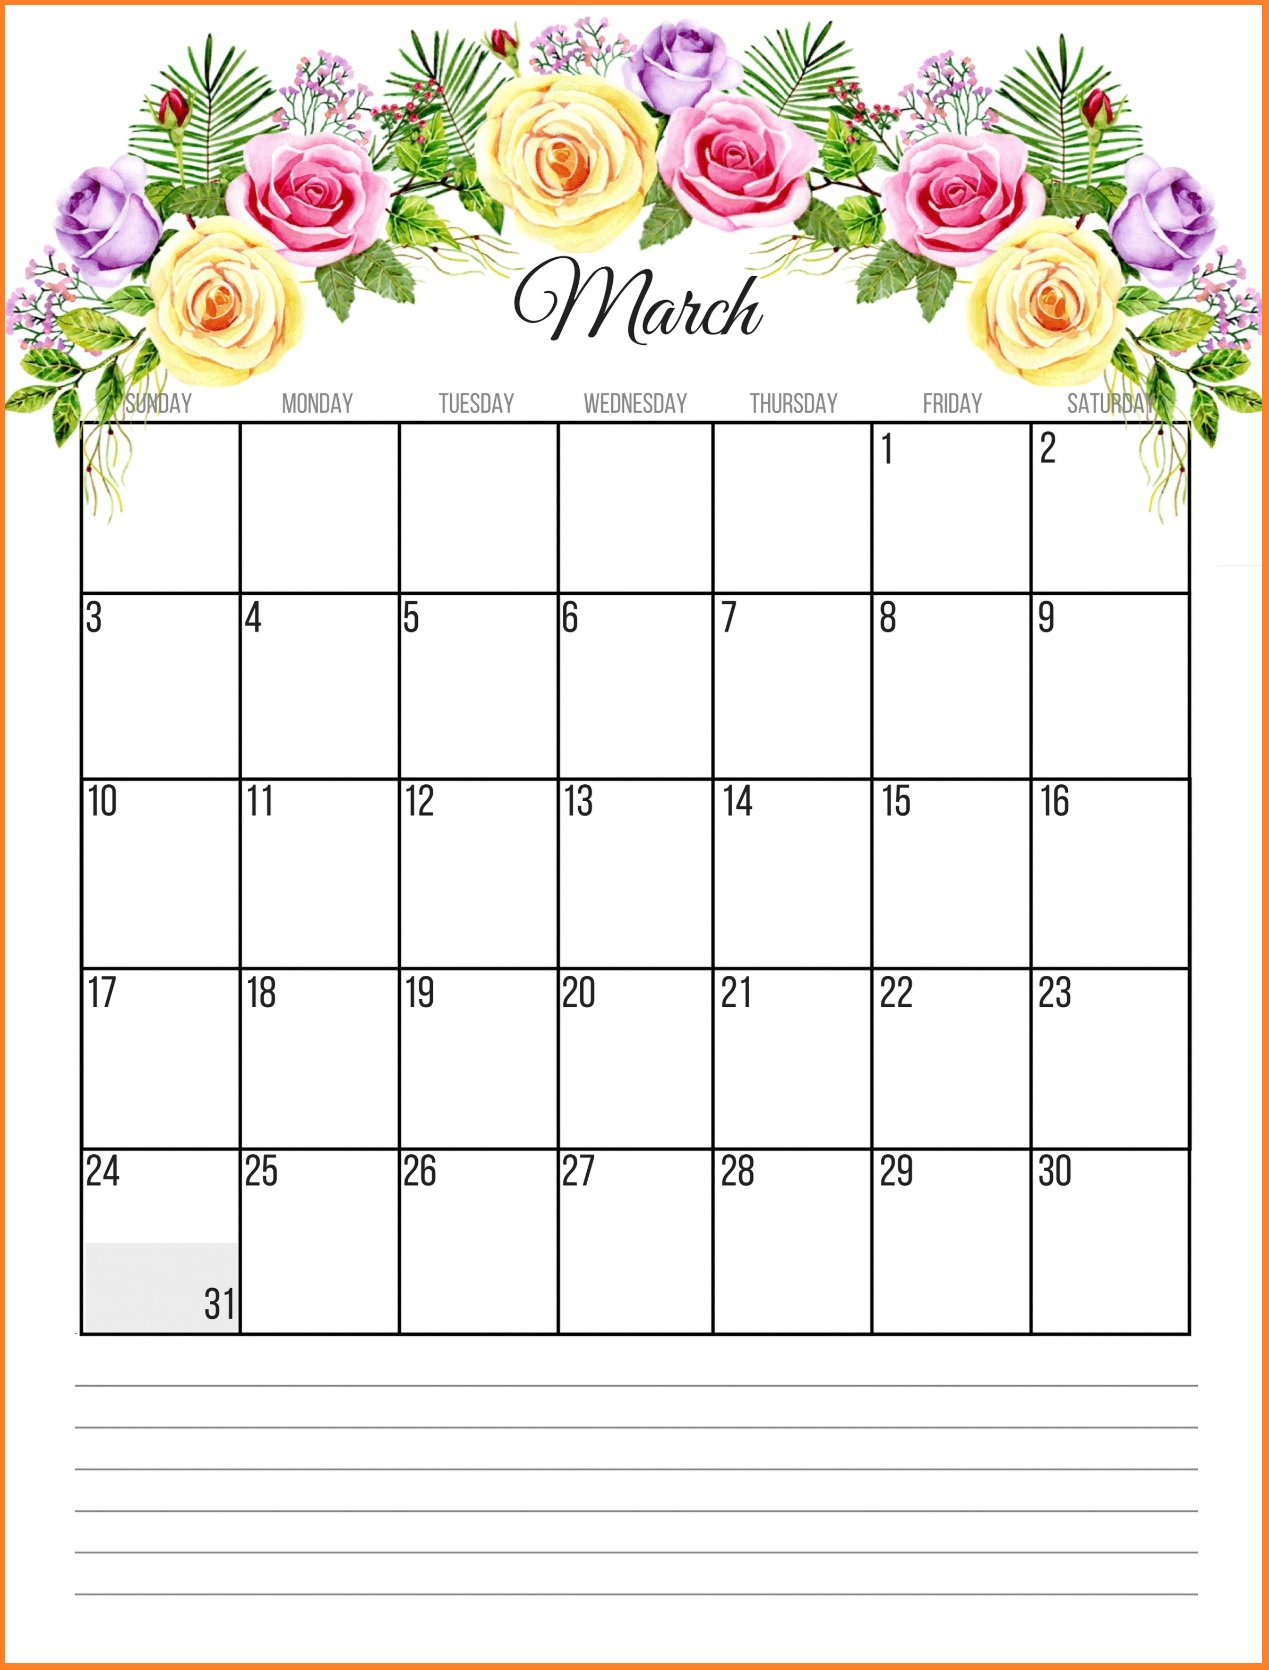 Printable Floral March 2019 Calendar Printable